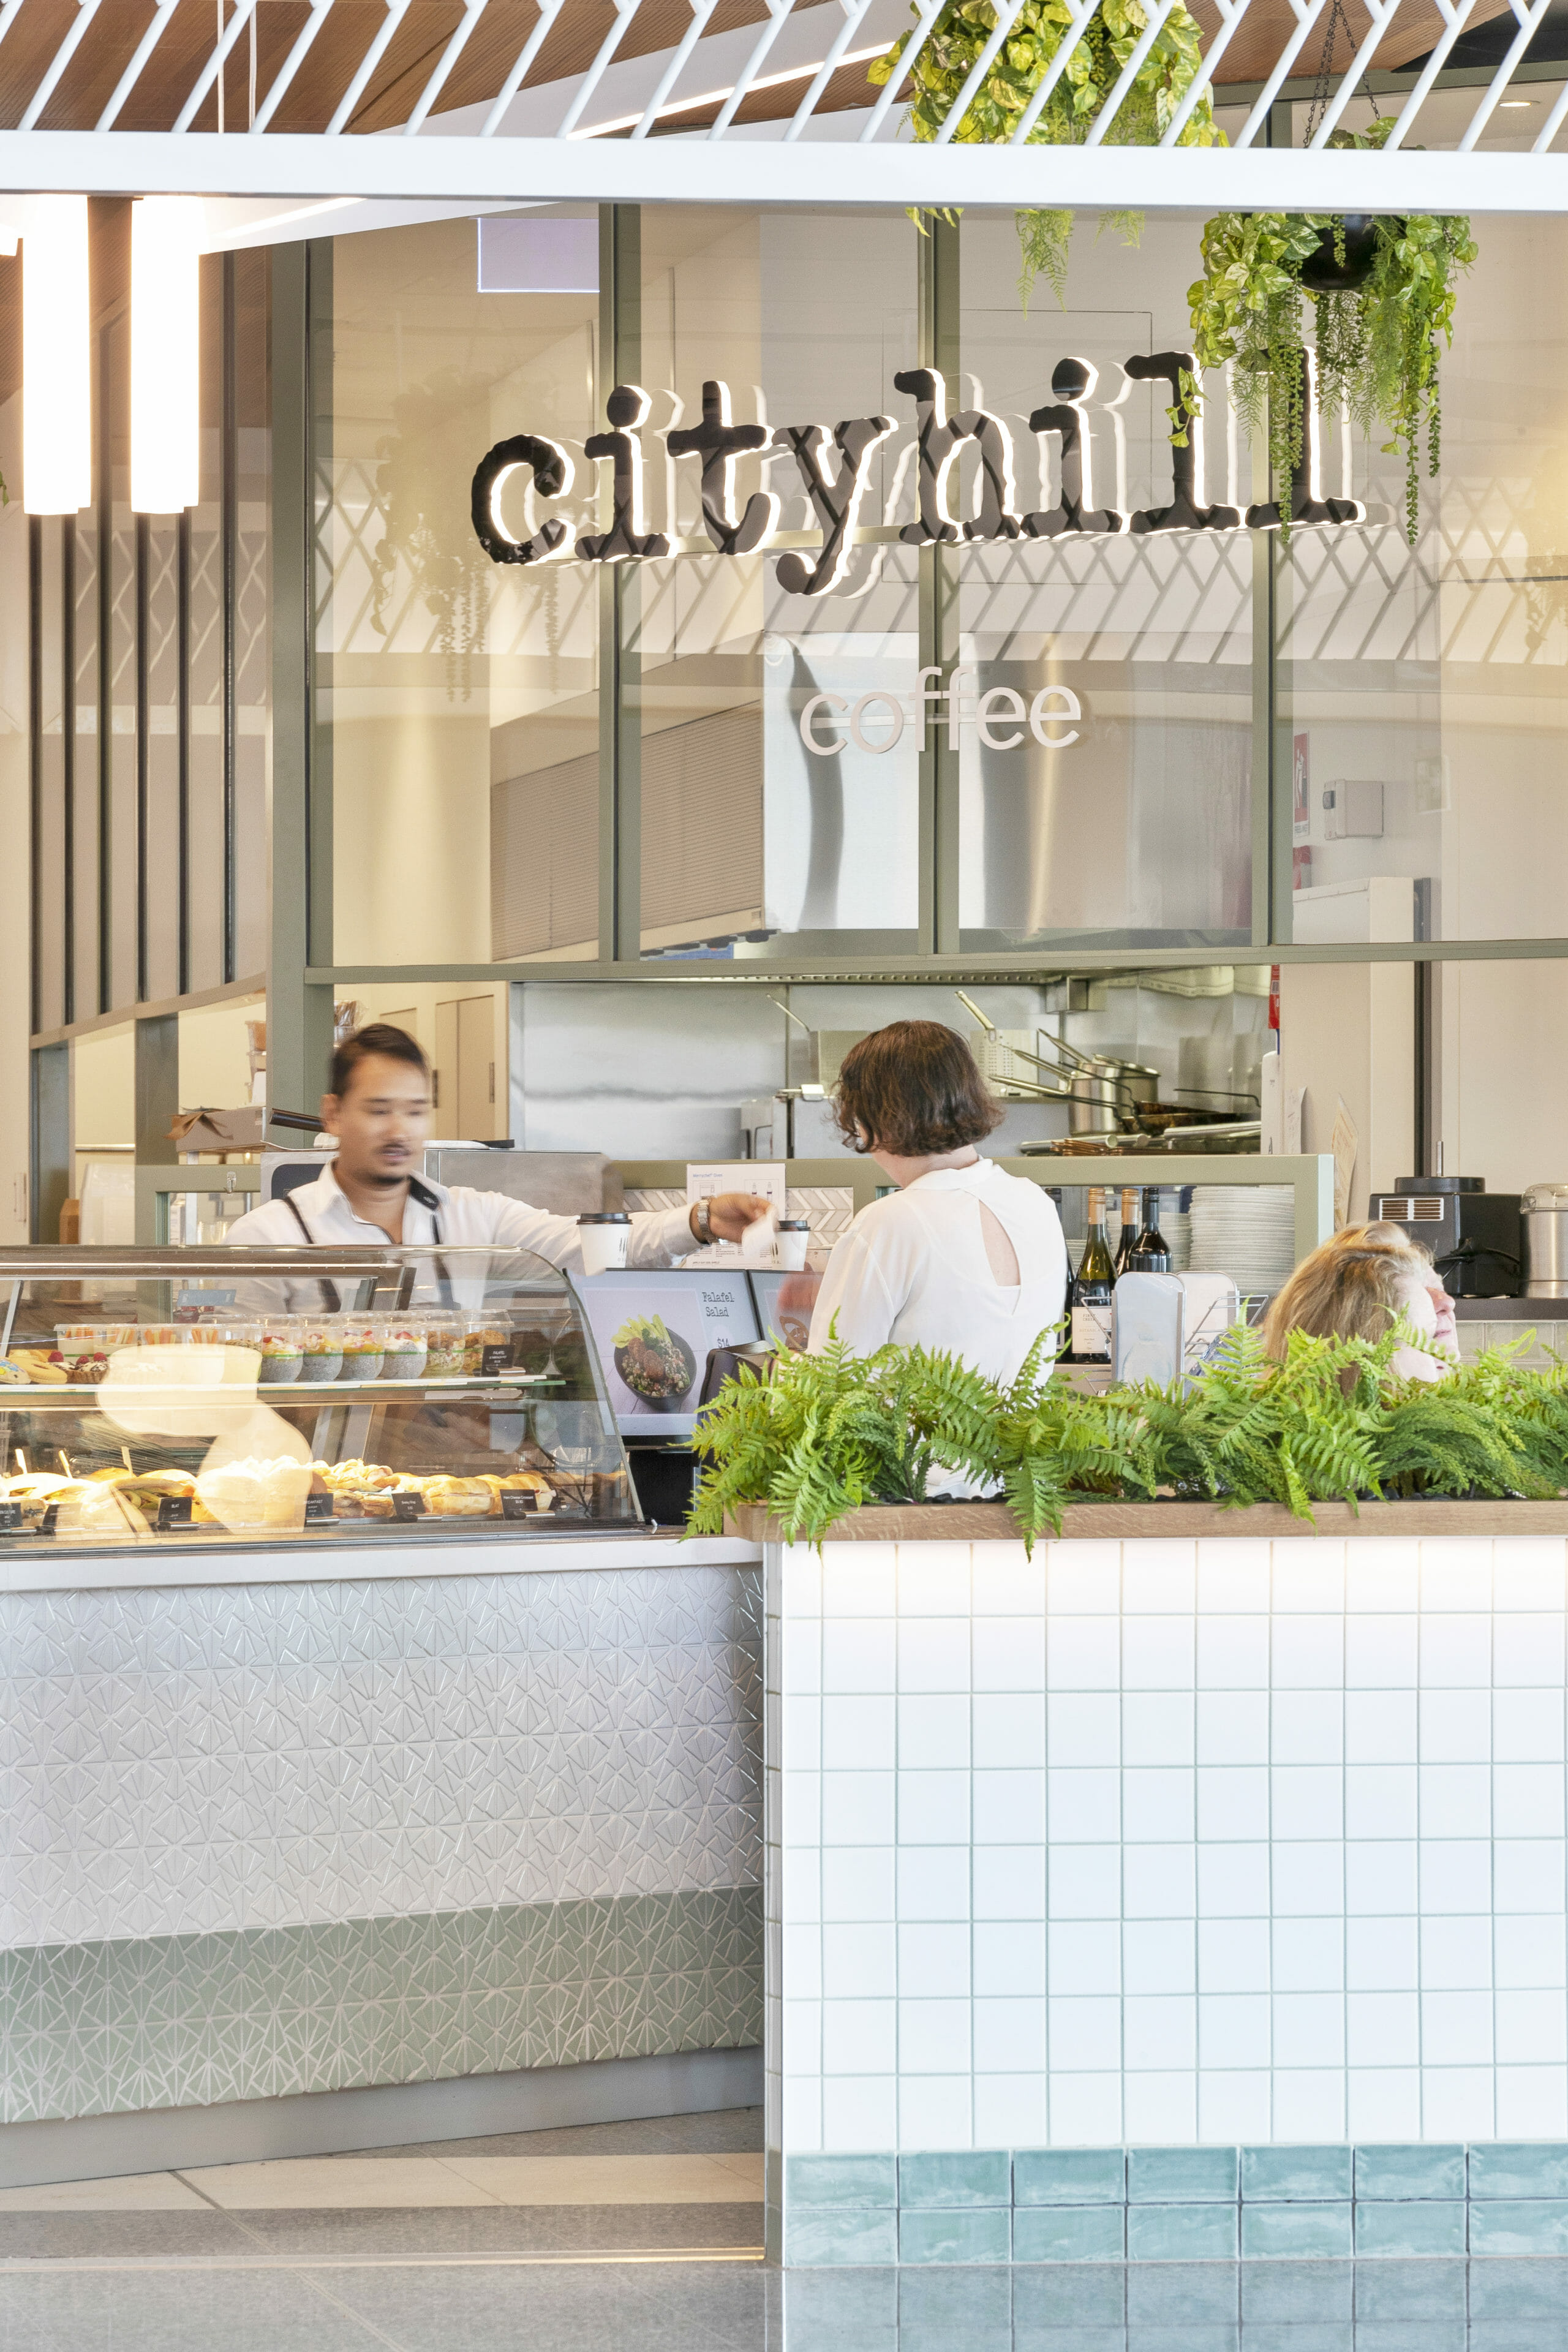 City Hill Coffee